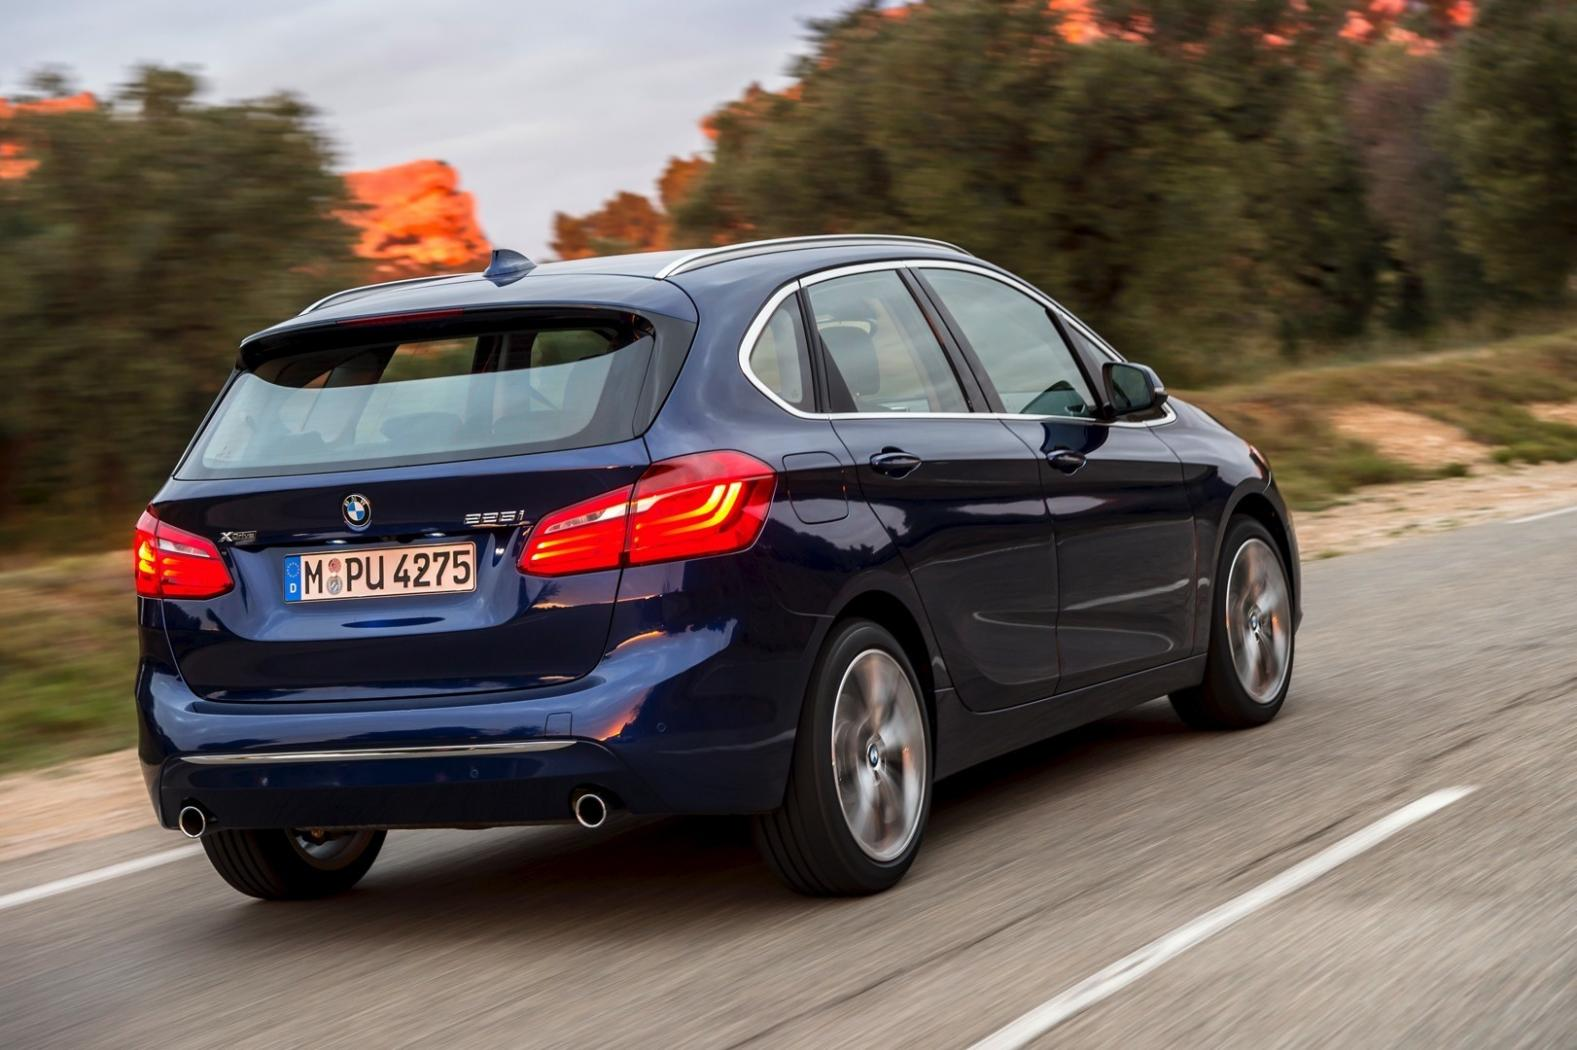 Fiche-occasion-BMW-Serie-2-Active-Tourer-F45-et-Gran-Tourer-F46-9.jpeg